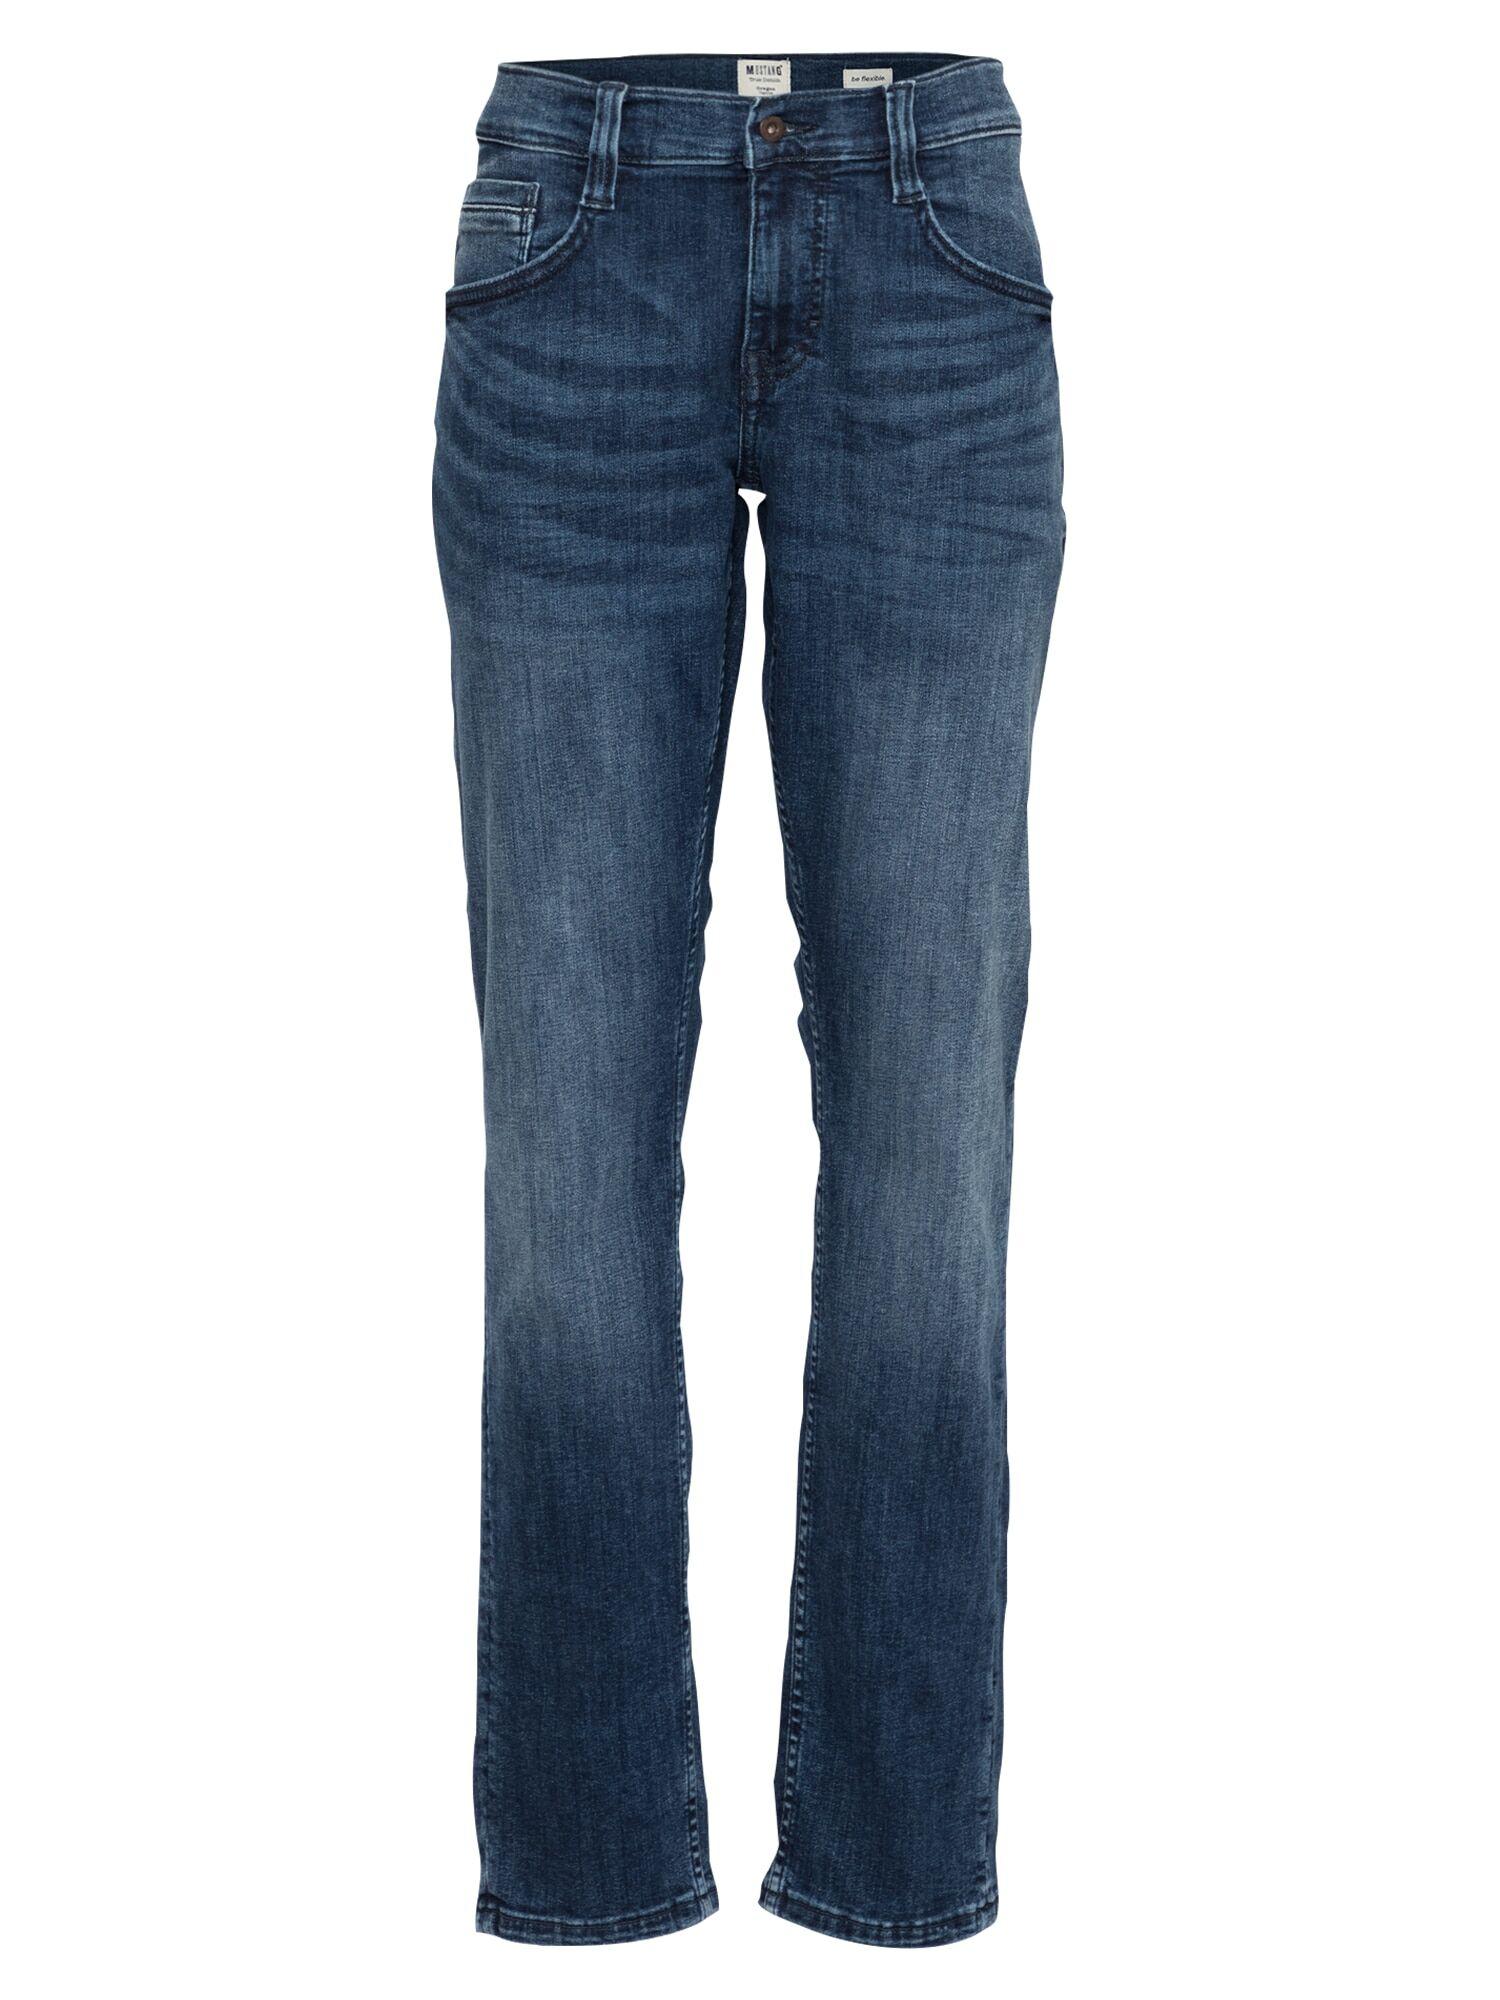 MUSTANG Jean 'Oregon'  - Bleu - Taille: 38/34 - male